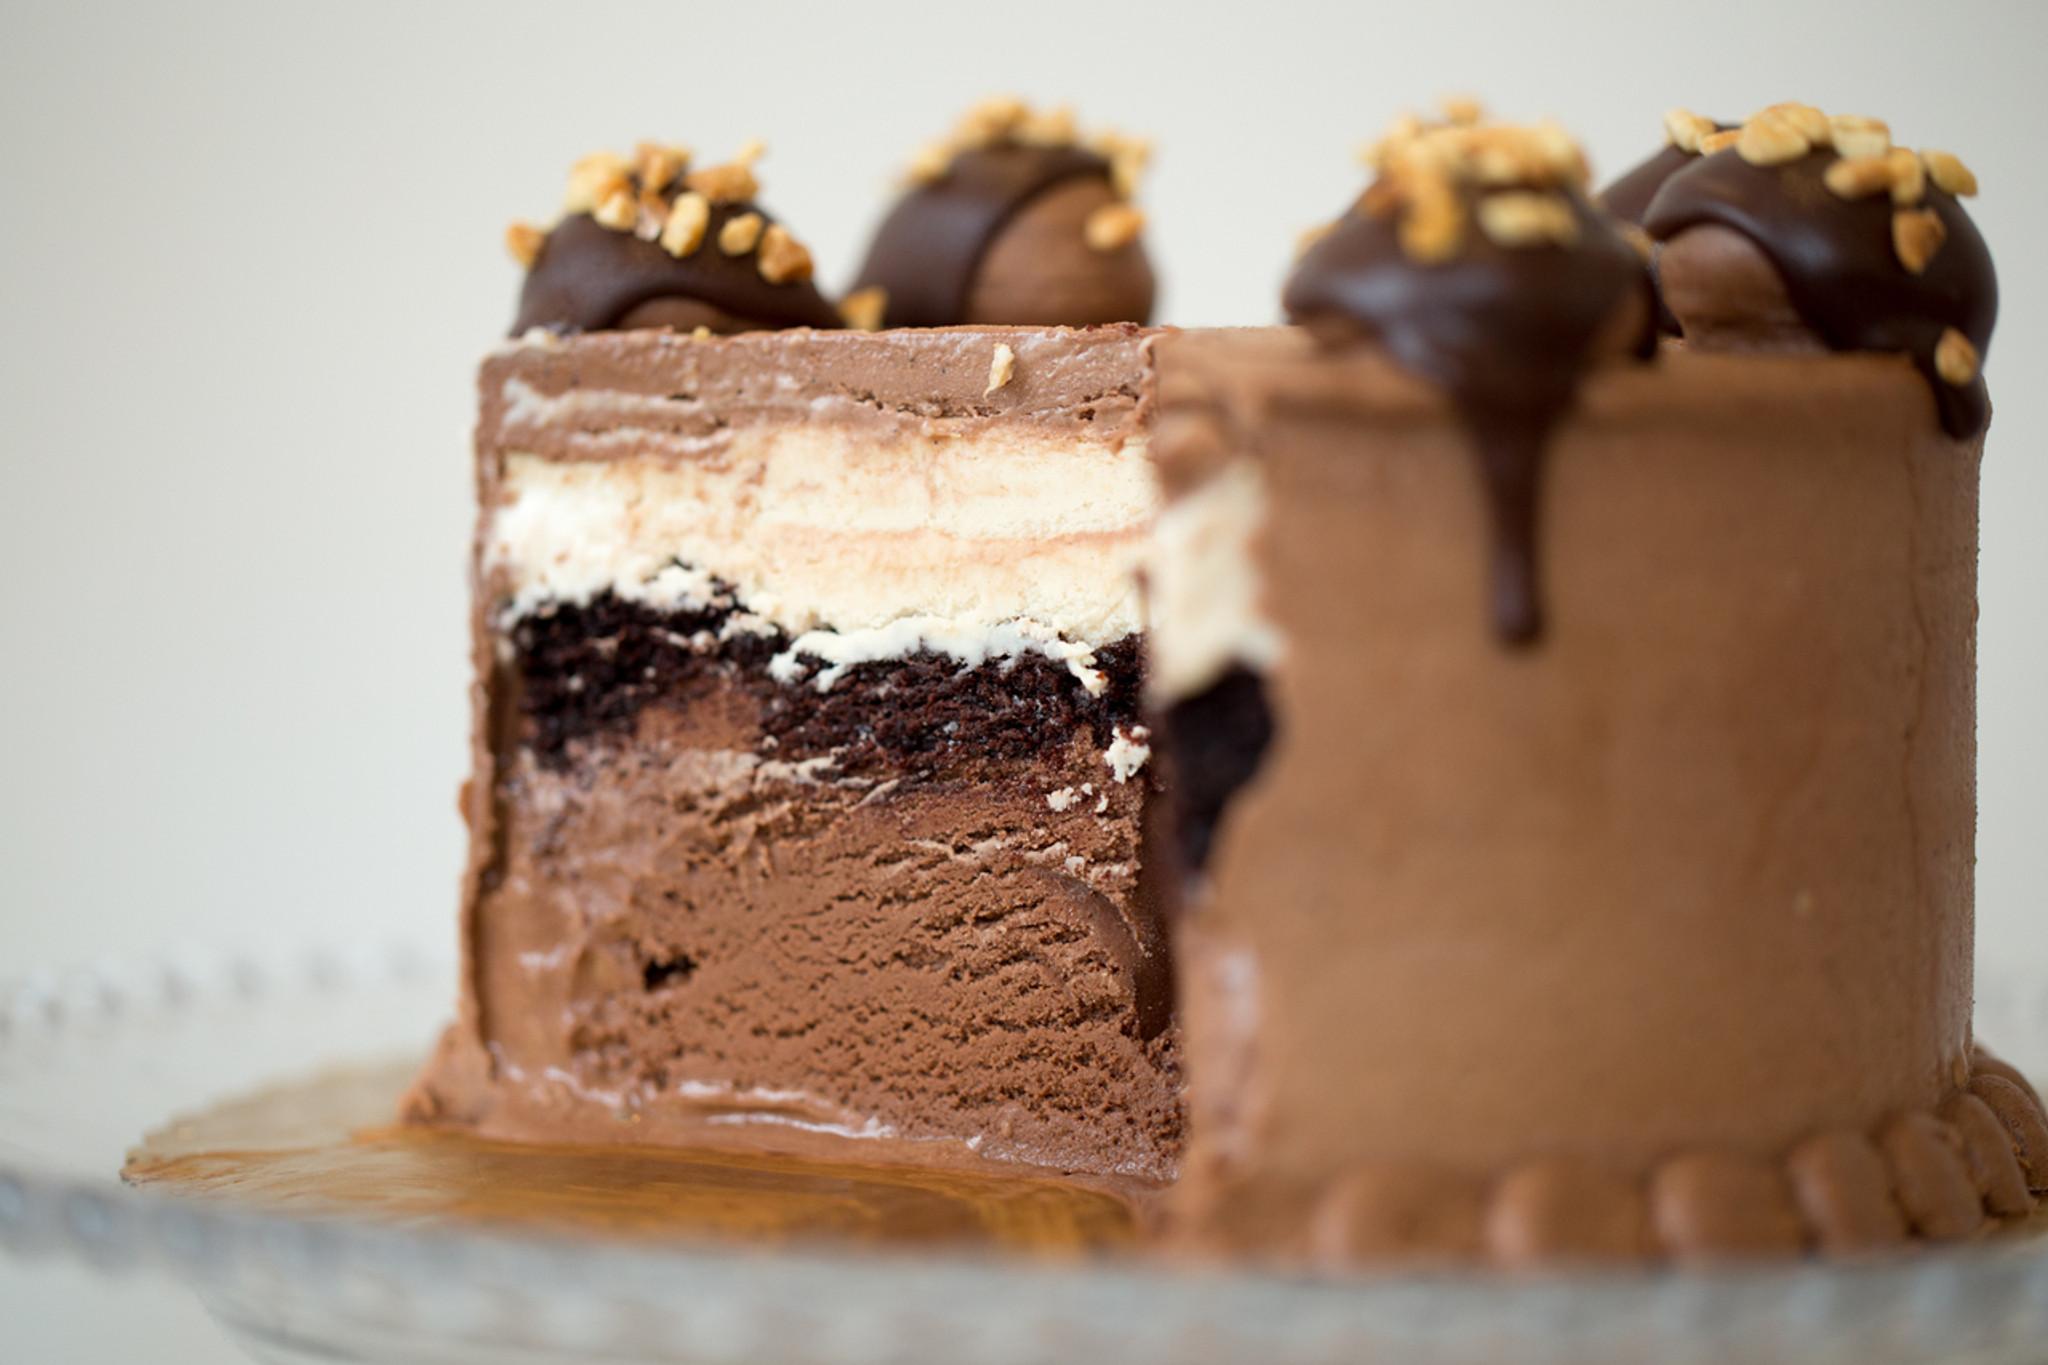 Permalink to Custom Ice Cream Cakes